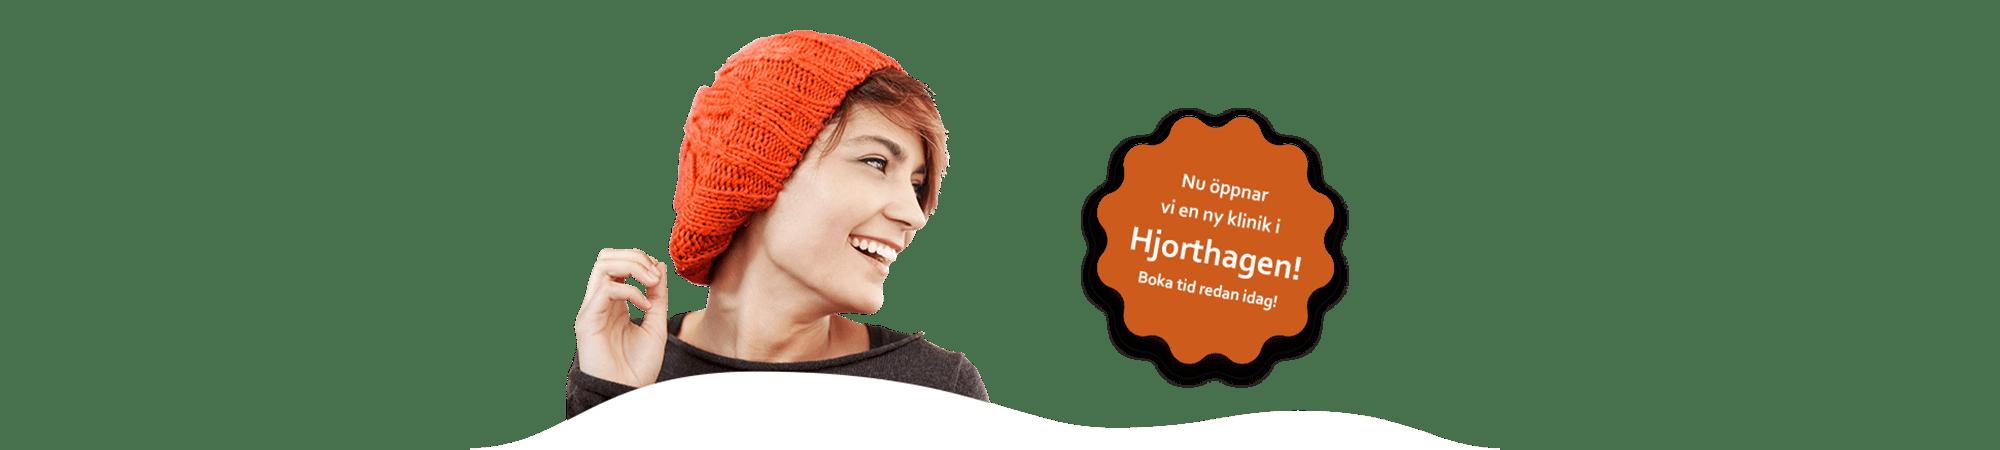 Tandea Hjorthagen